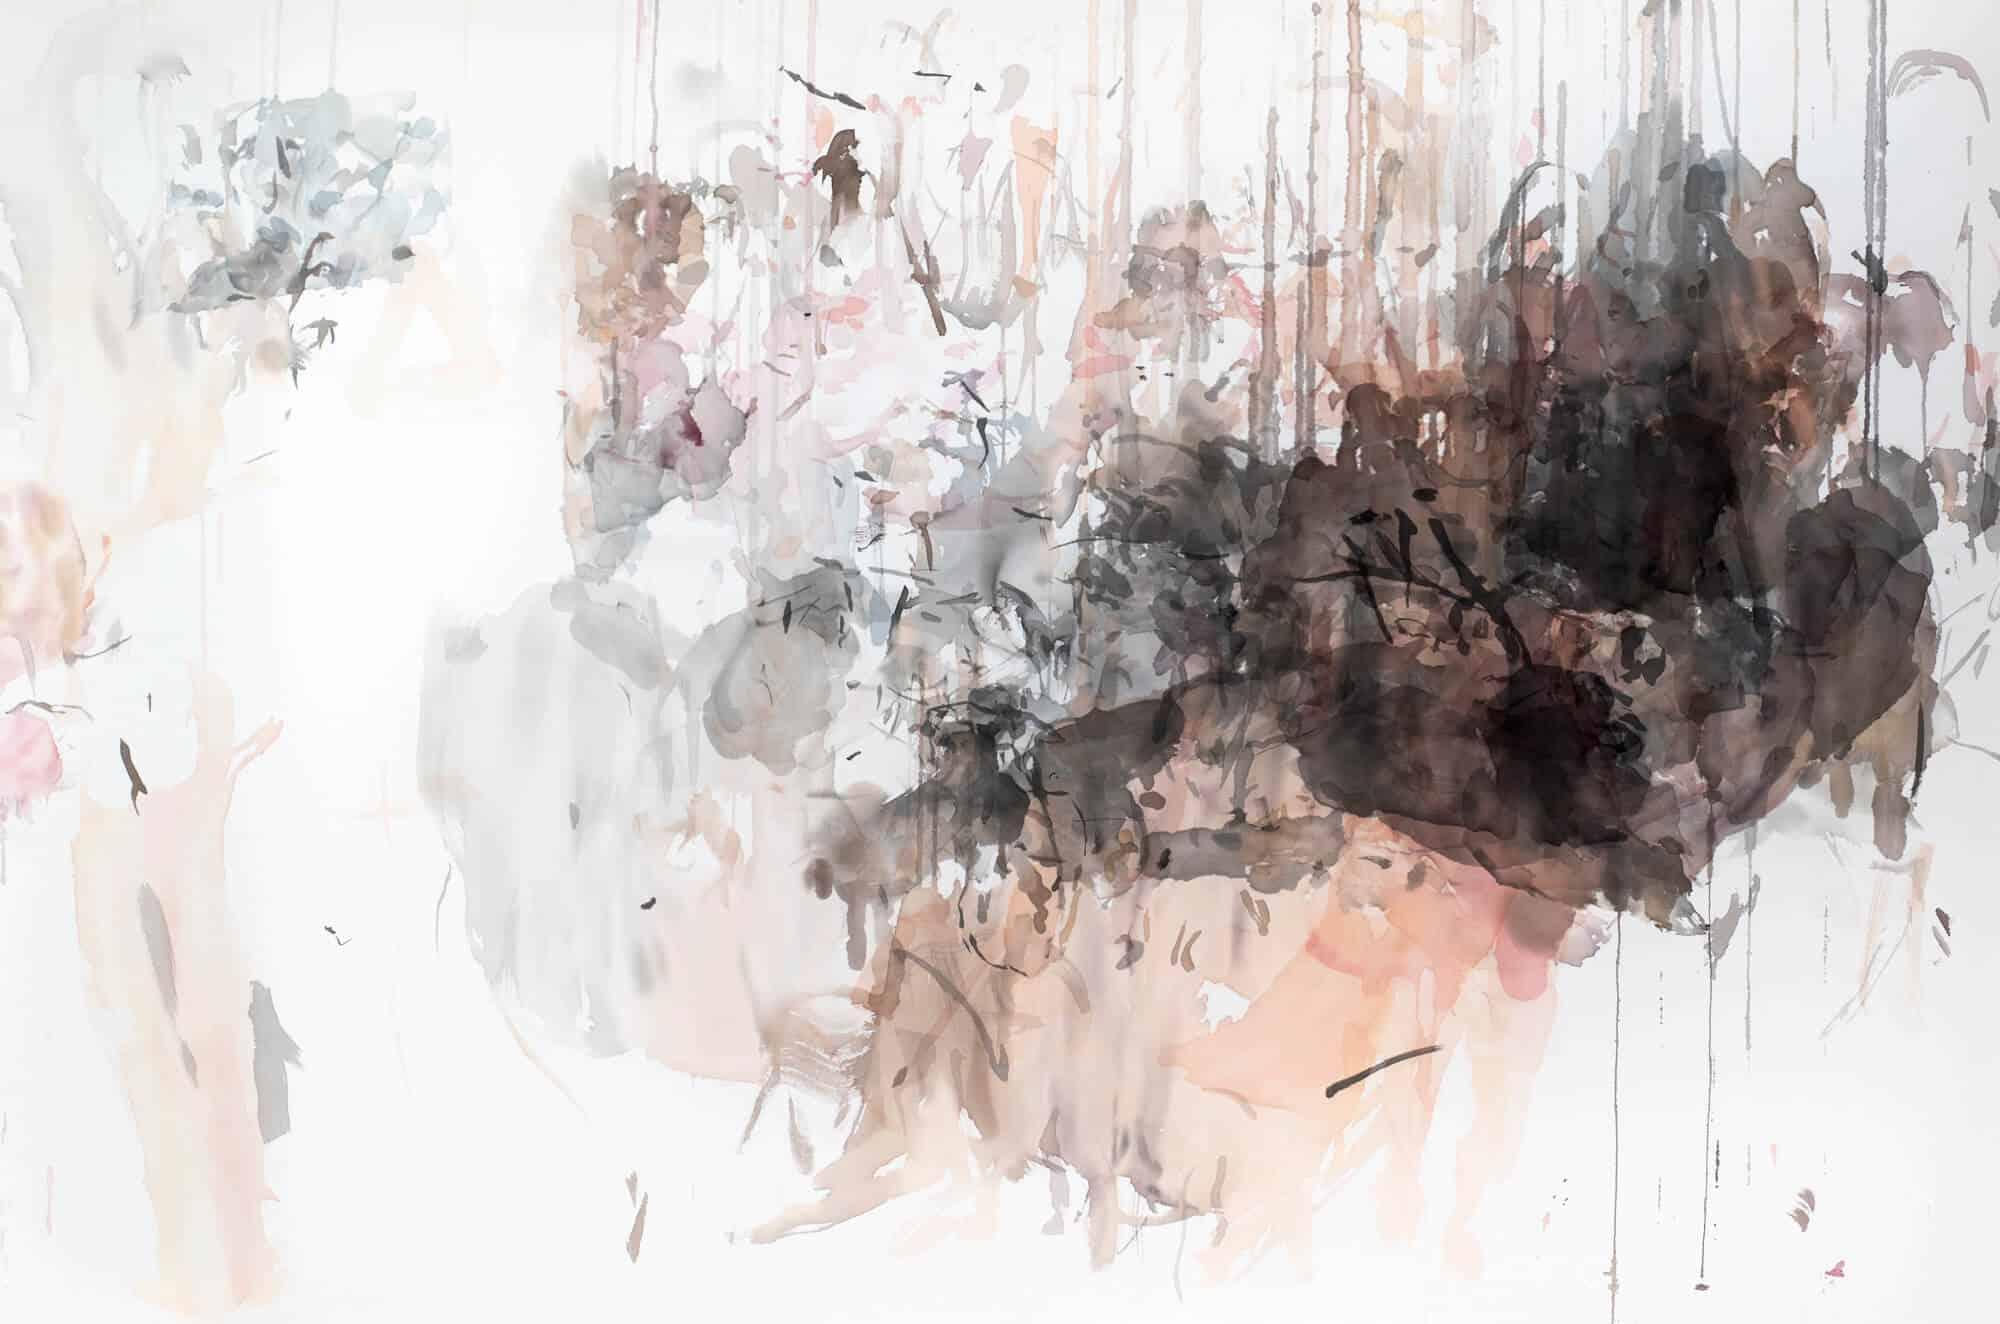 Katehrine Bull, Leora & Paul, 2019. Ink on cotton, 120 x 180cm. Courtesy of the artist & SMITH.